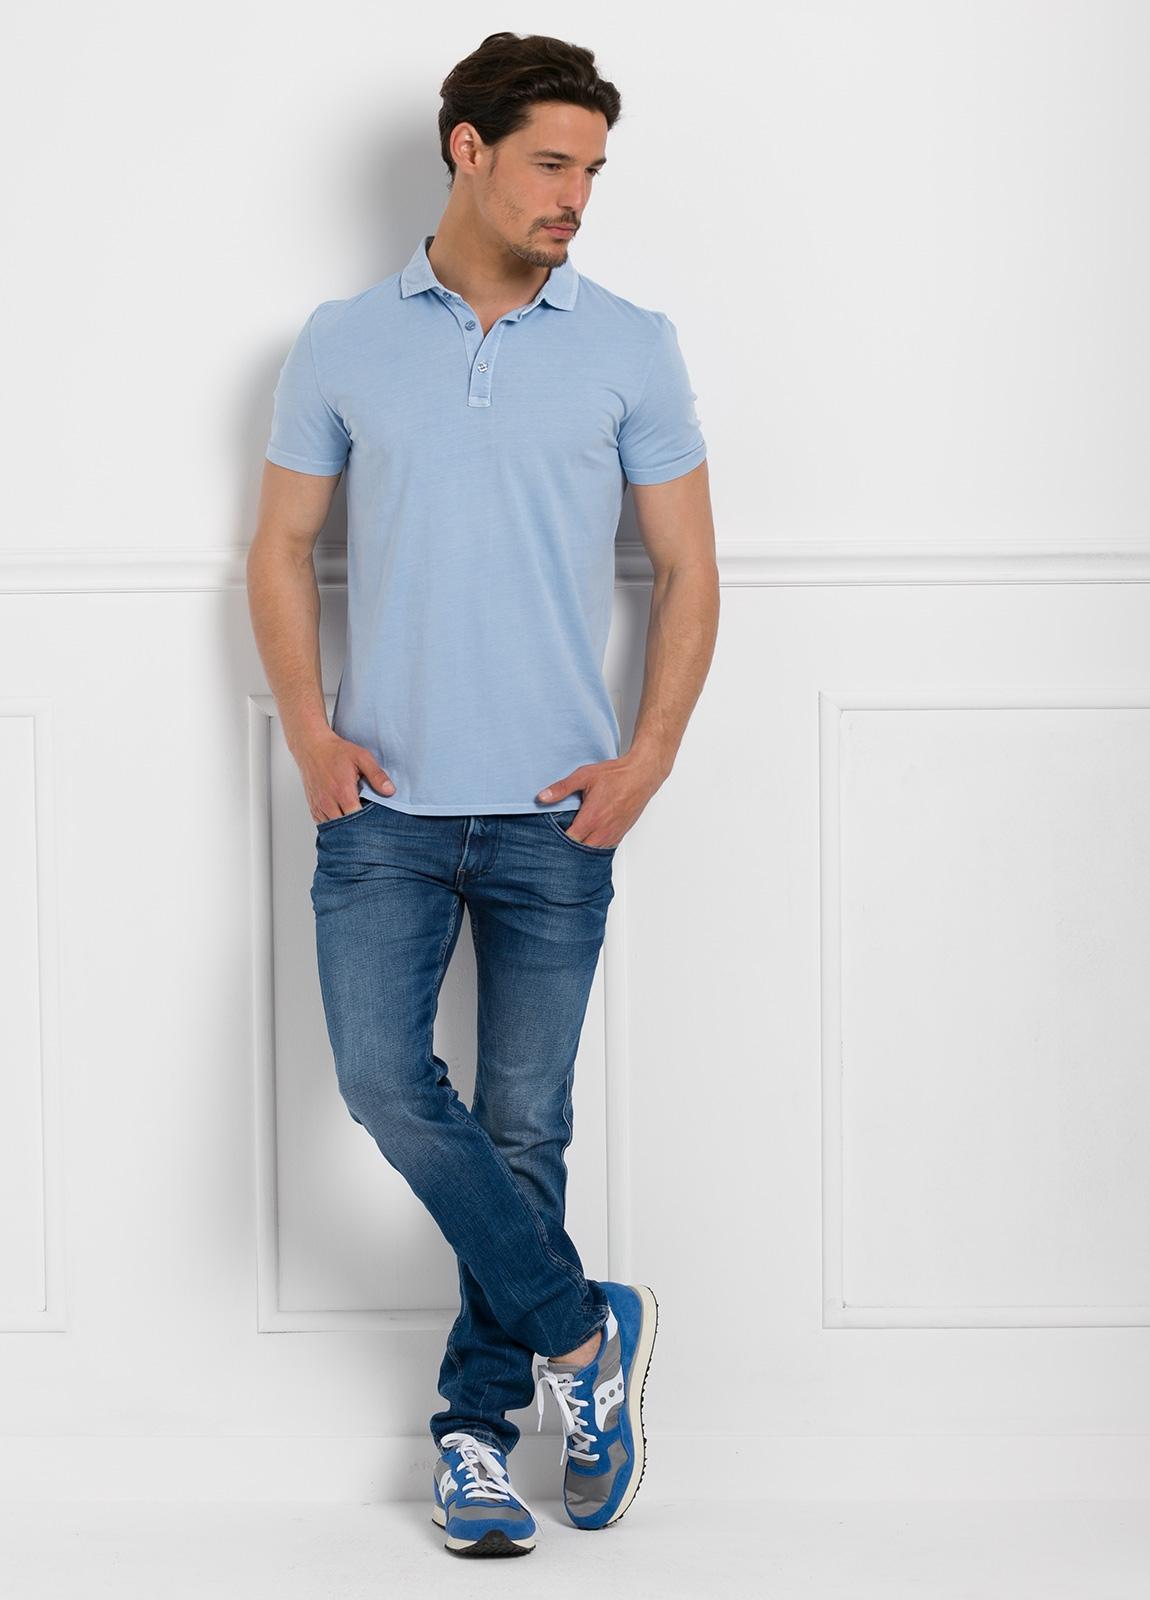 Polo liso manga corta, color azul celeste. 100% Algodón interlock.